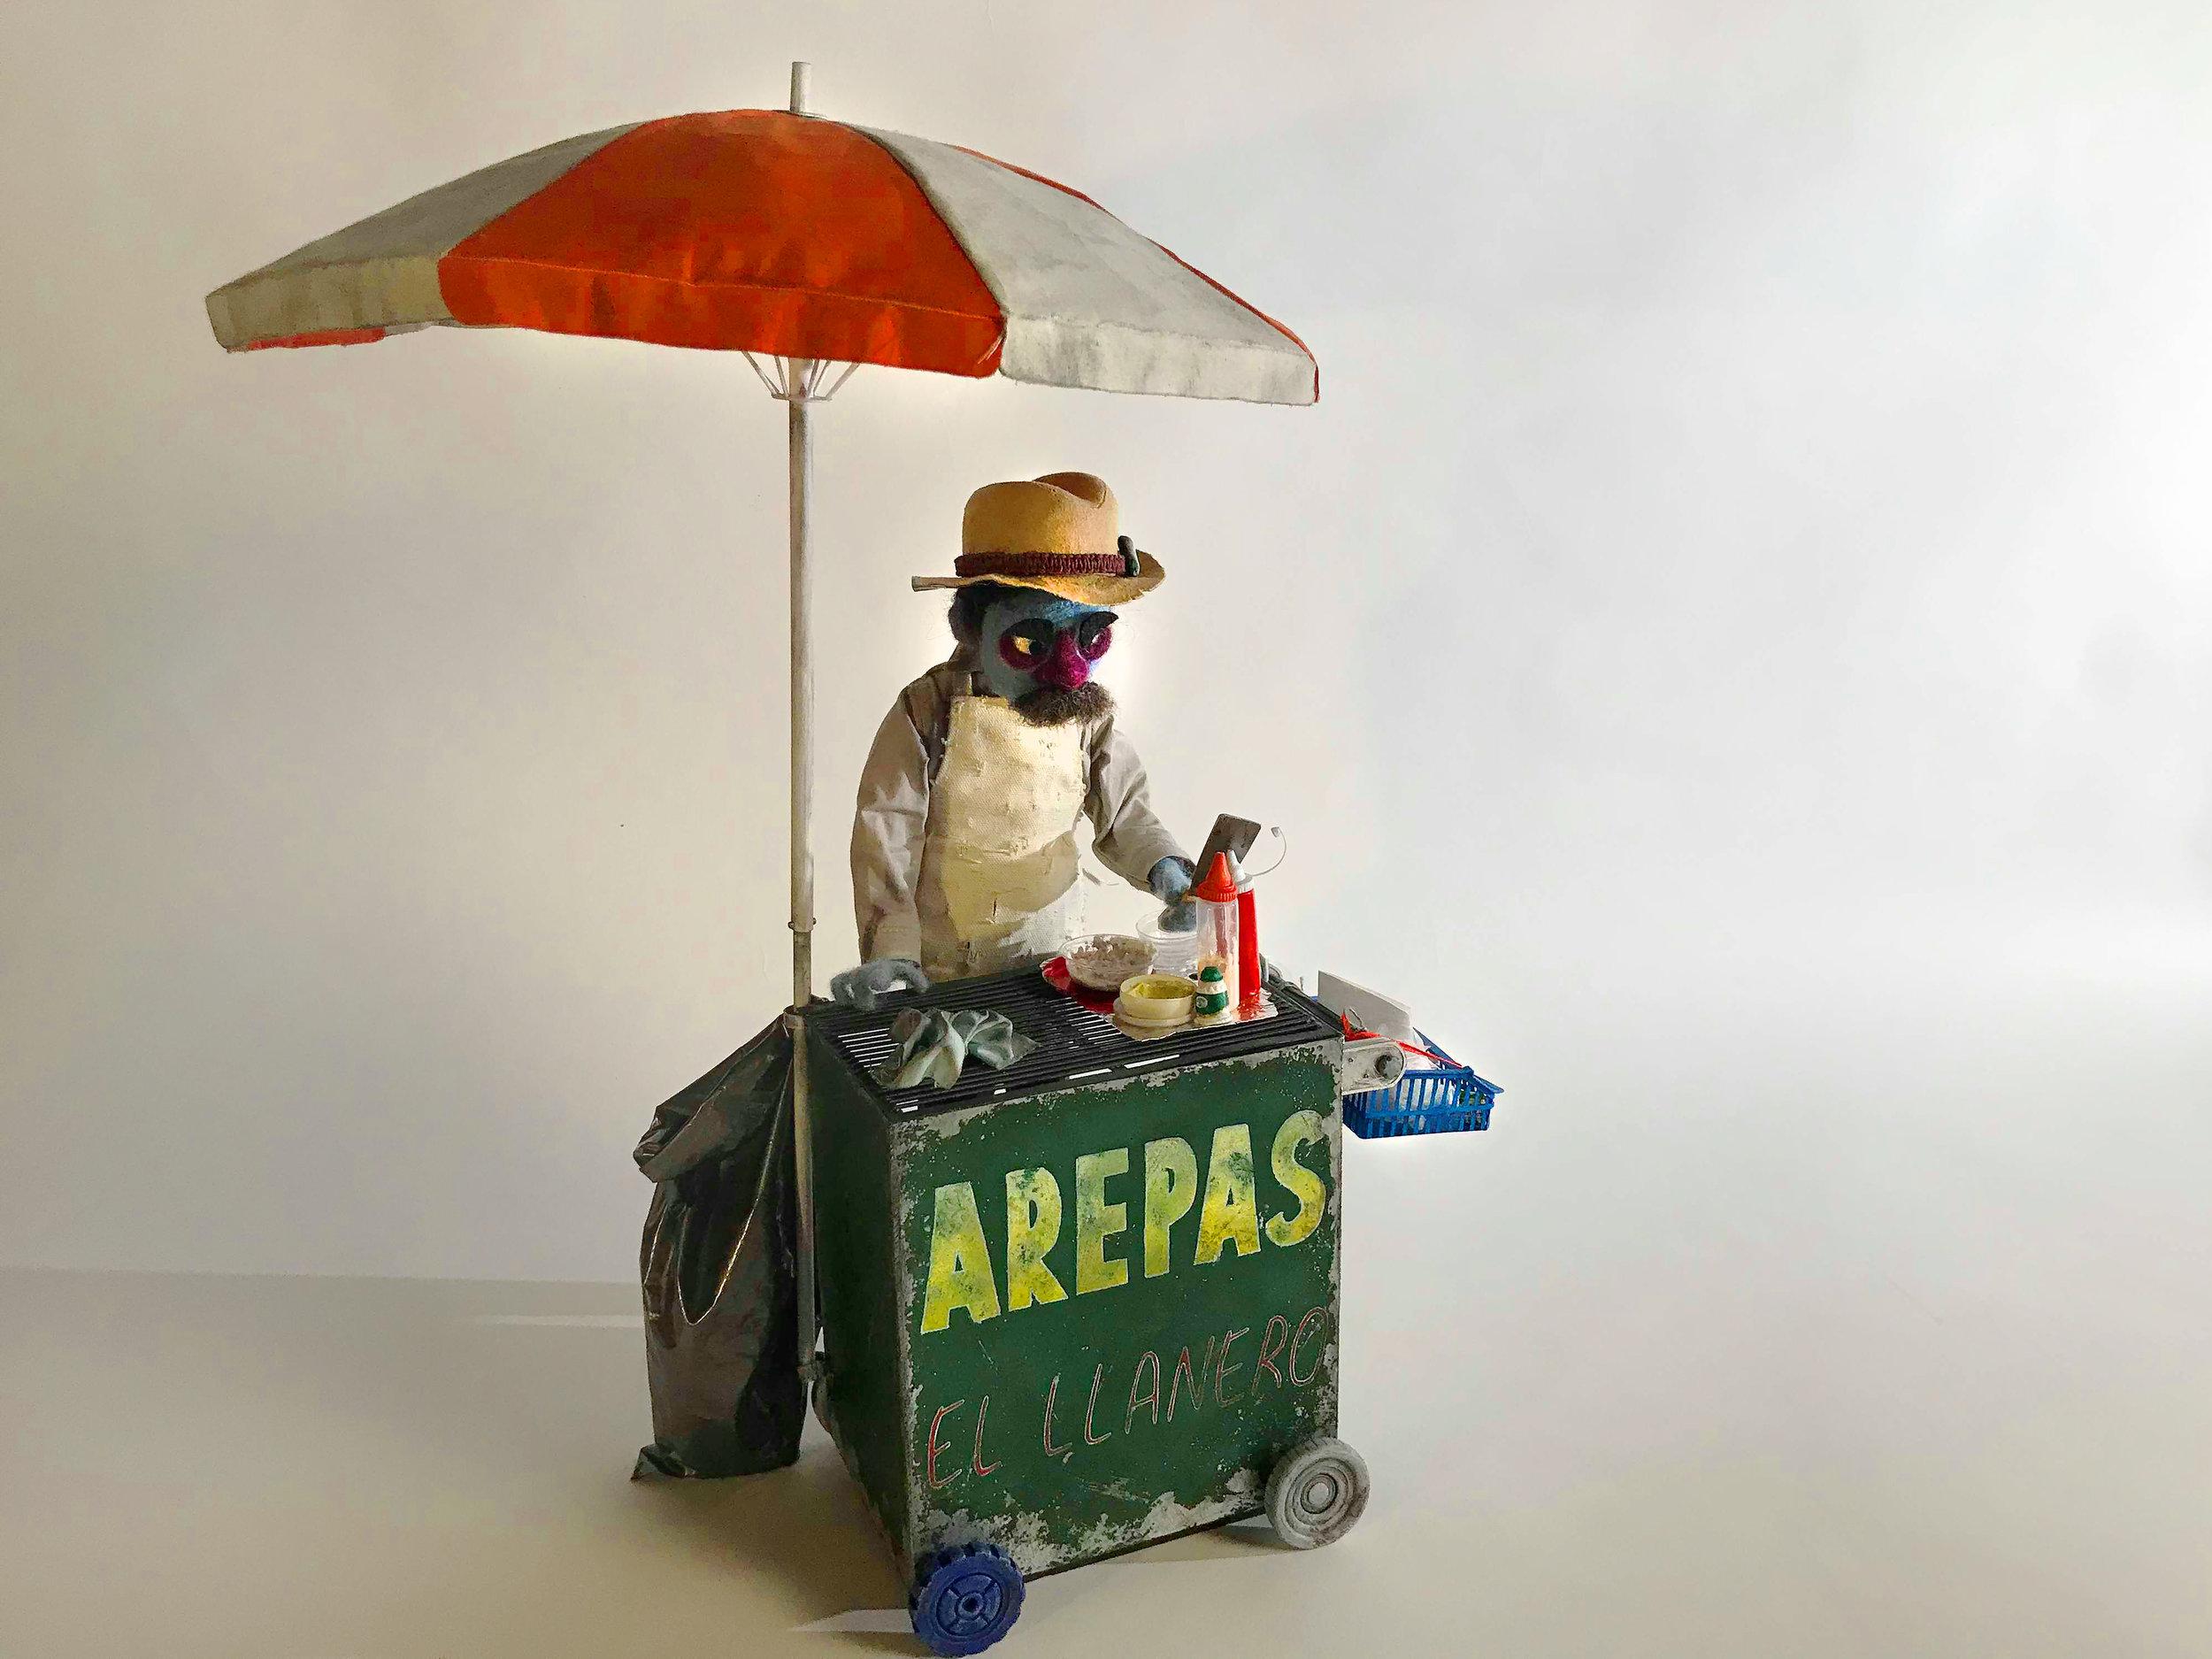 Arepas Cart Prop with Animatable Umbrella